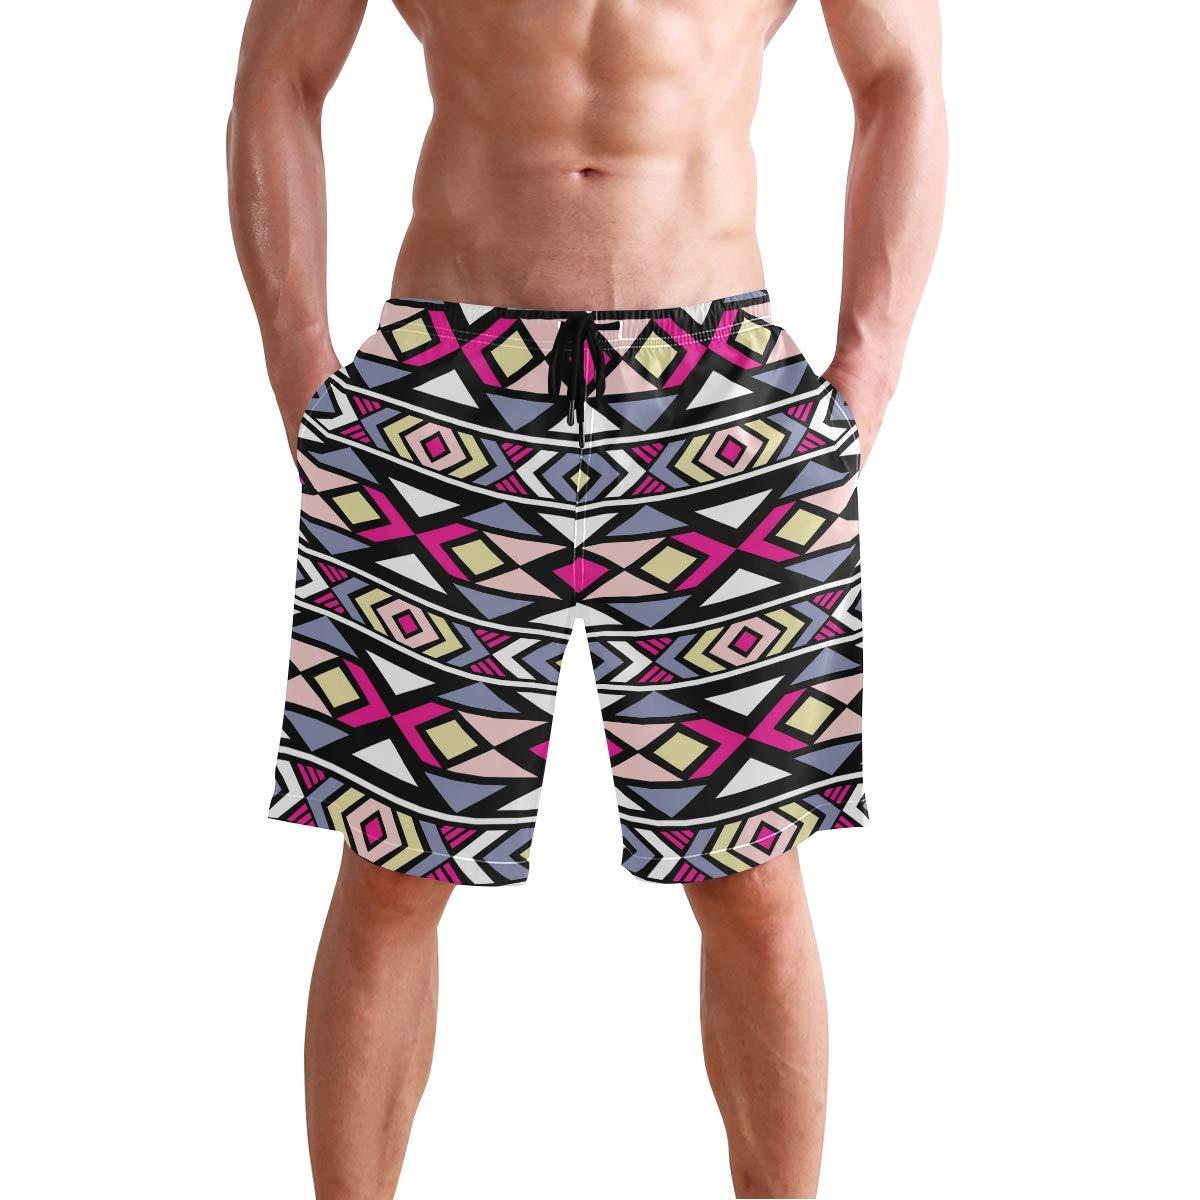 Ethnic Geometric Mens Trunks Beach Board Shorts Drawstring Waist Mesh Lining